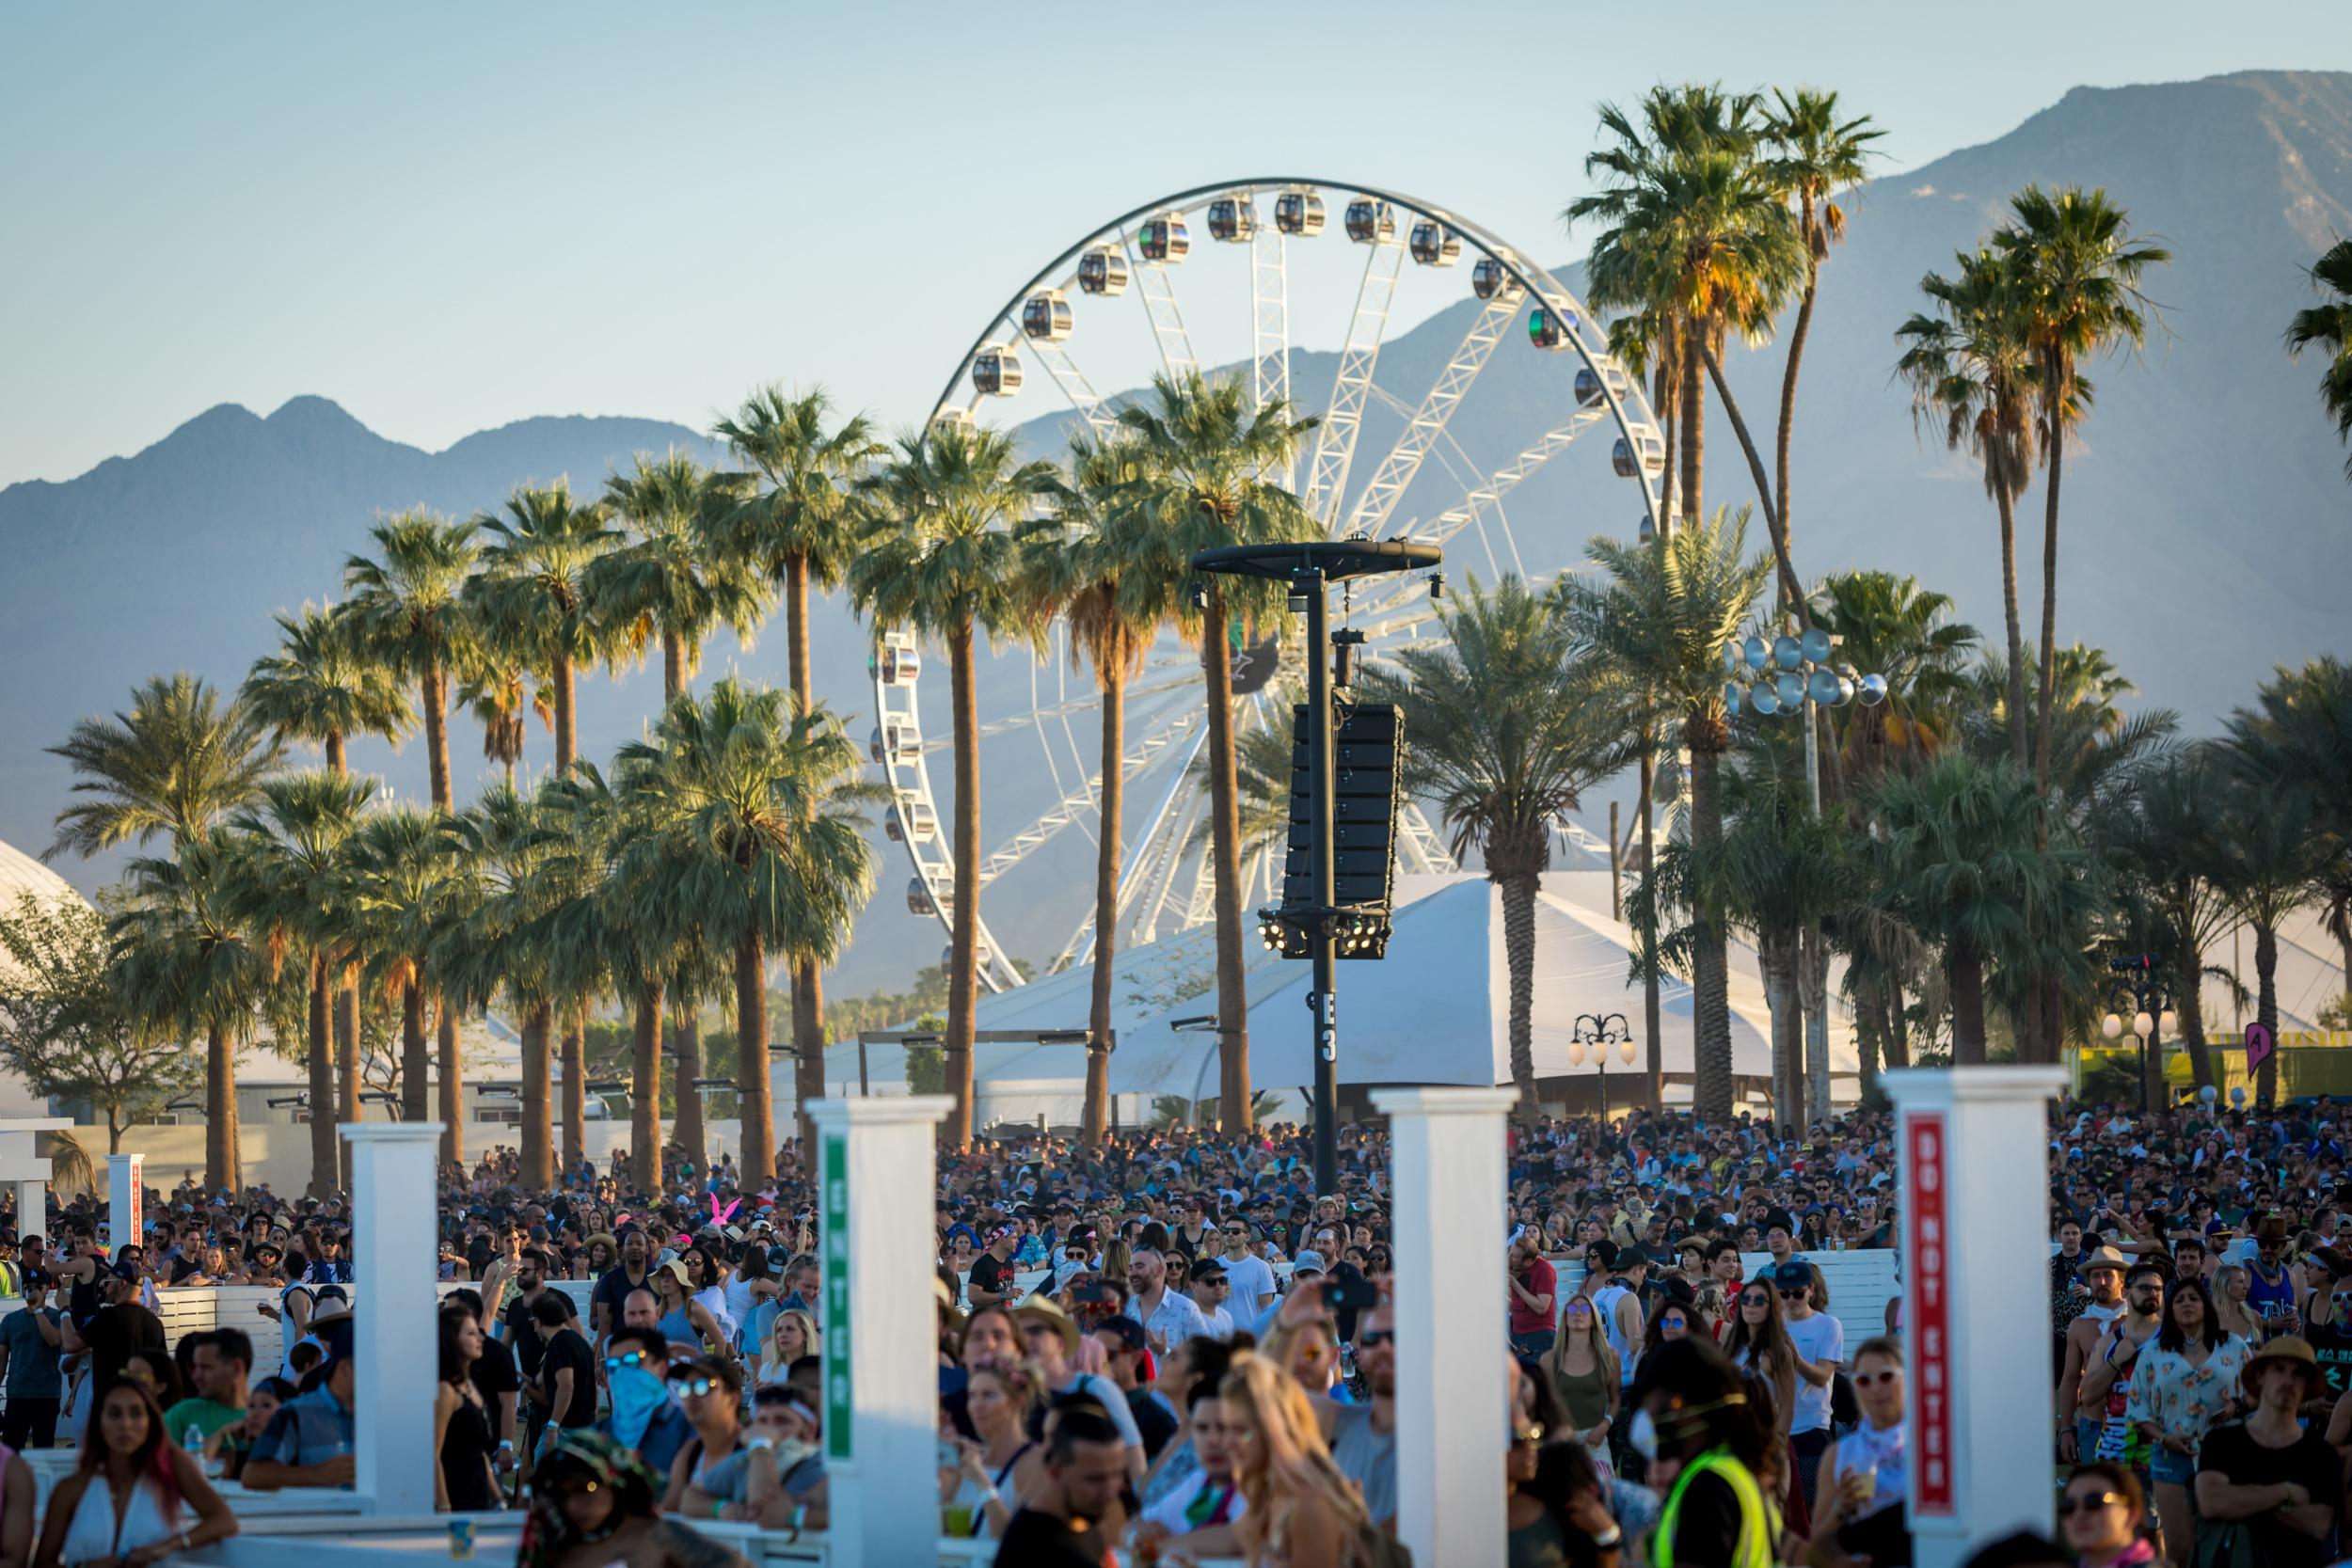 CEWebsite-Gallery-Festivals-Coachella-2.JPG